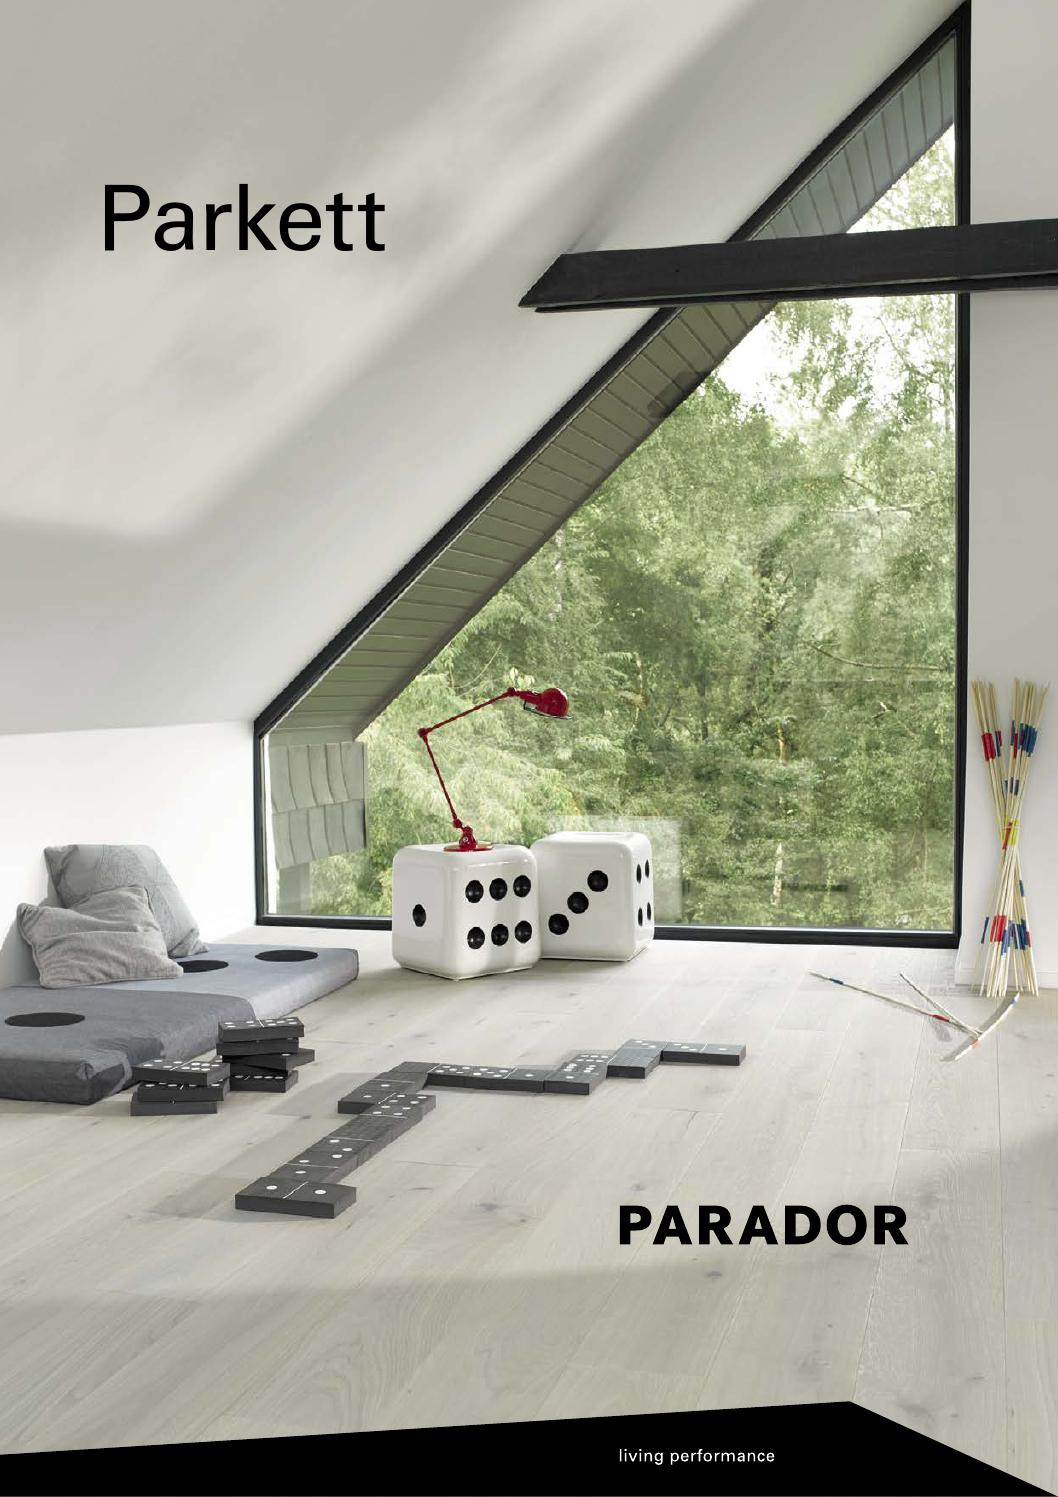 parador parkett by kaiser design issuu. Black Bedroom Furniture Sets. Home Design Ideas